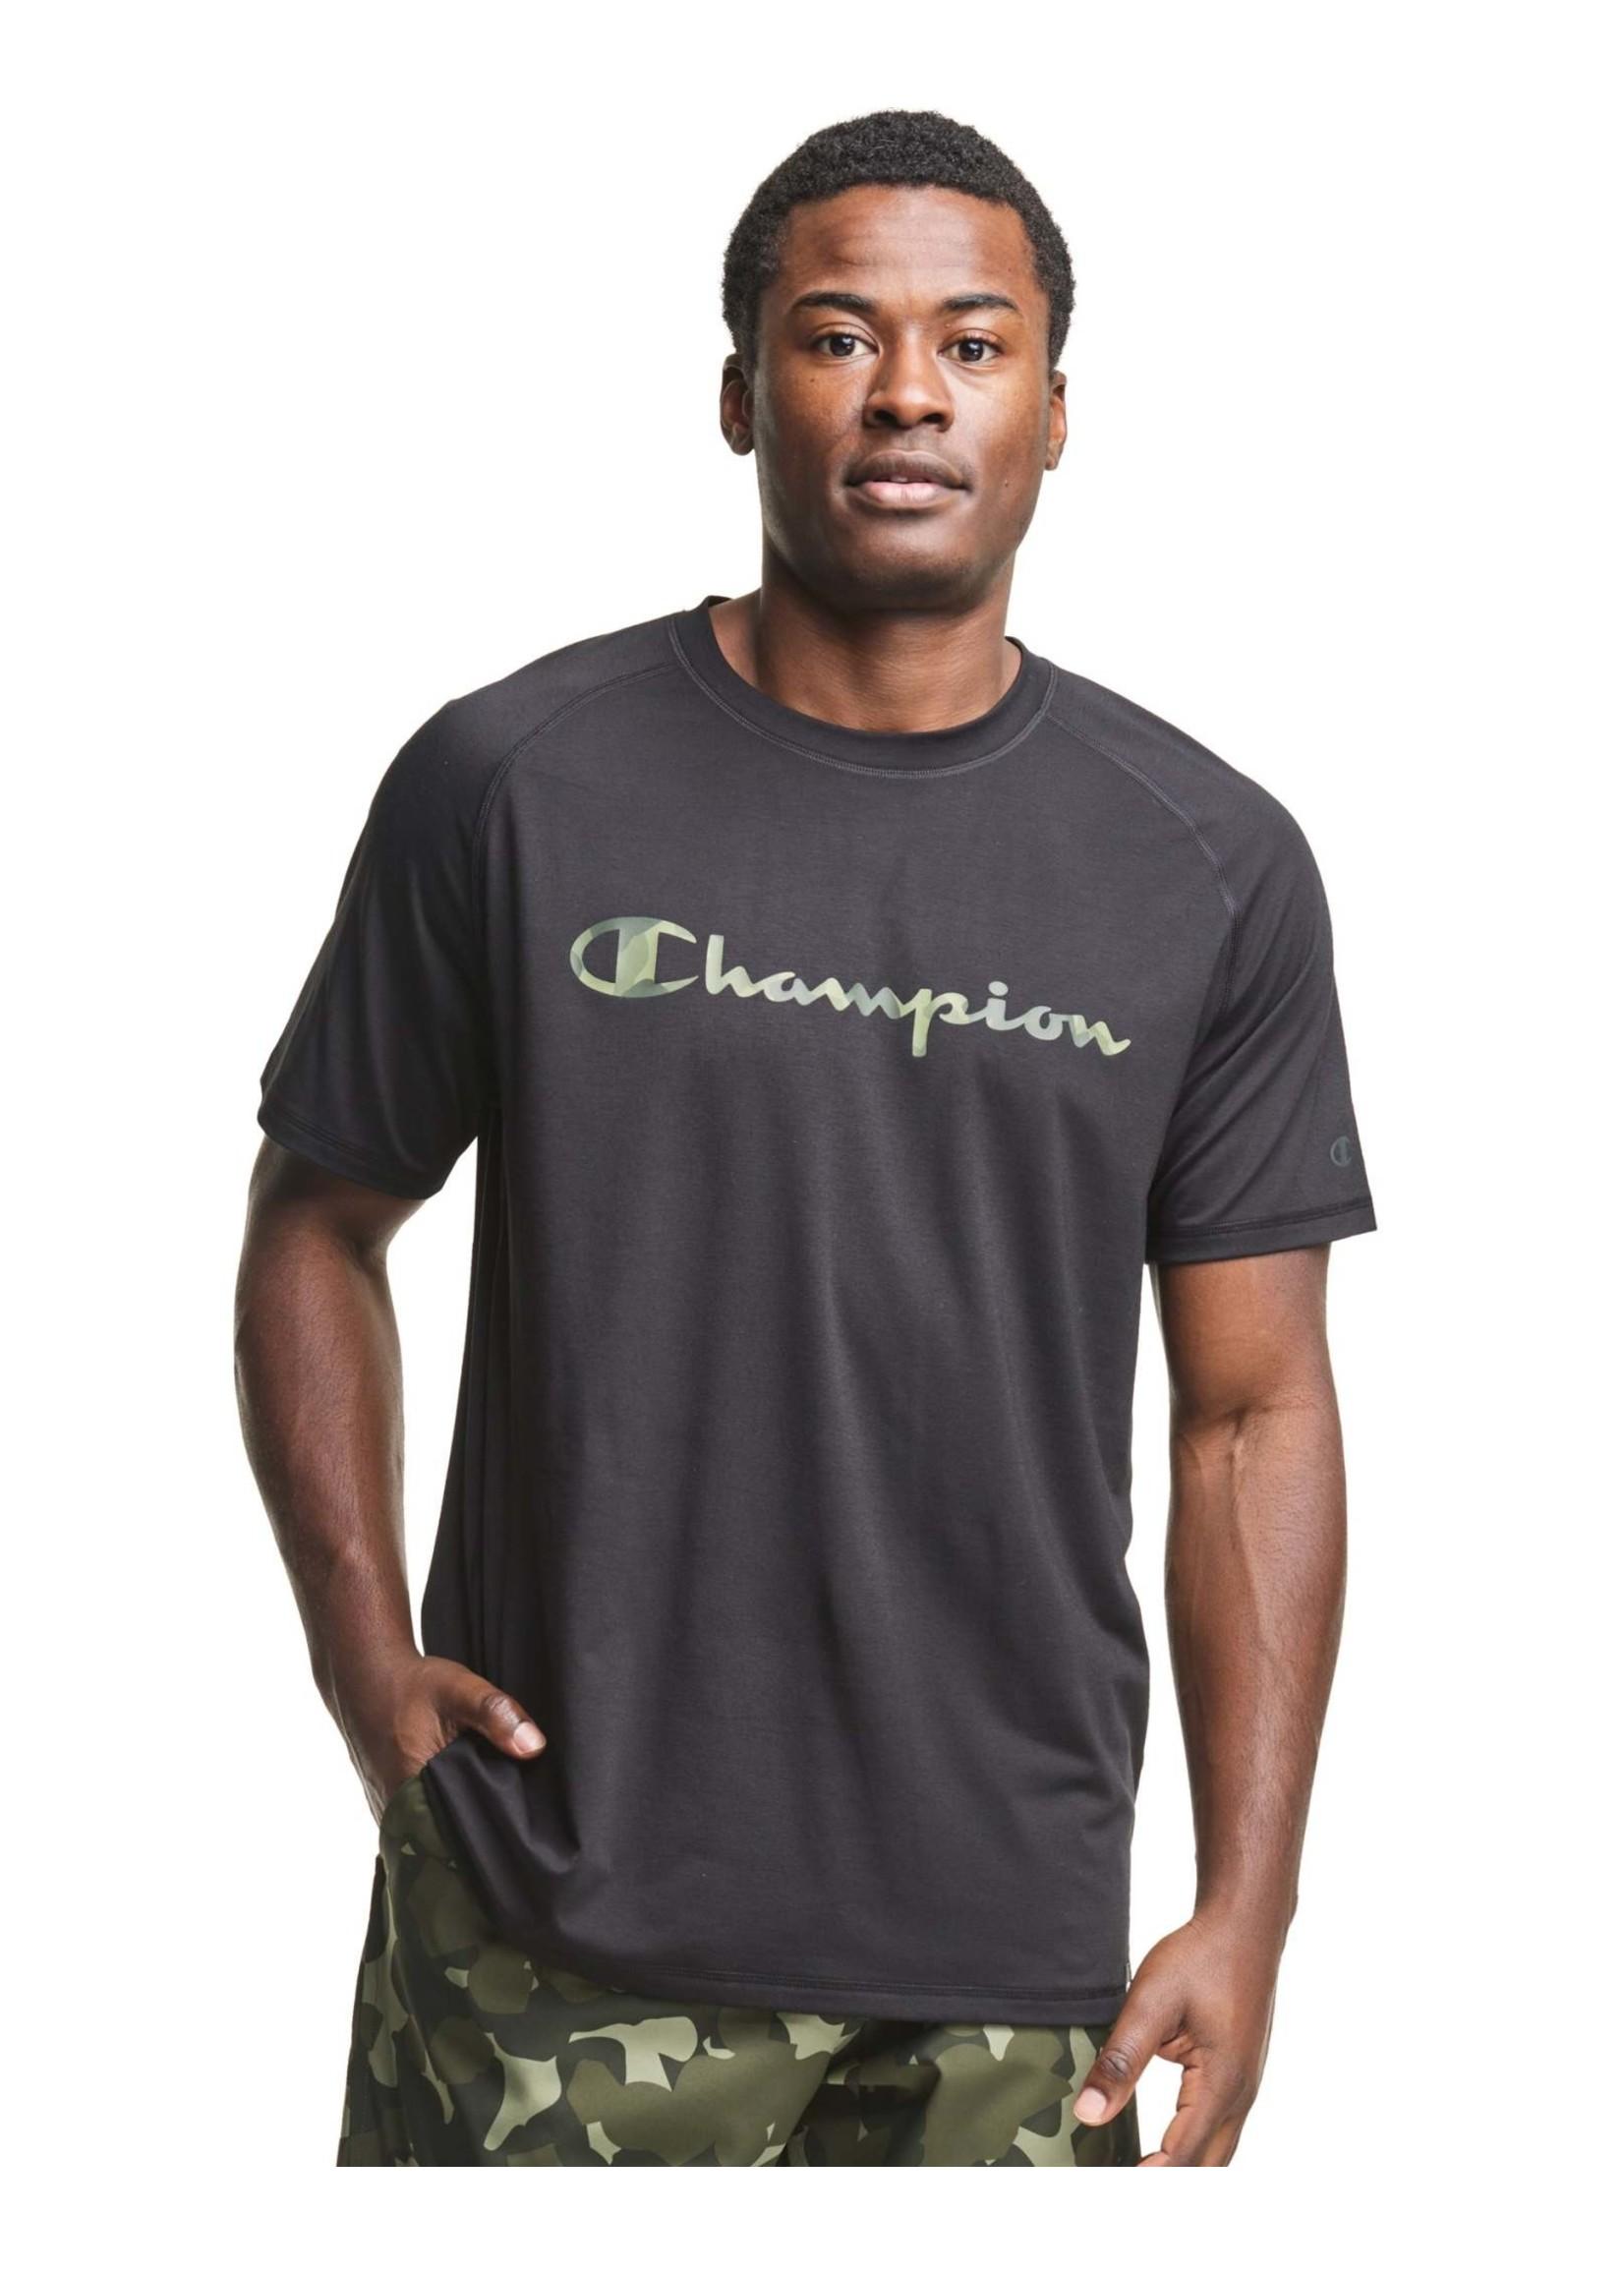 CHAMPION T-shirt Graphic City Sport